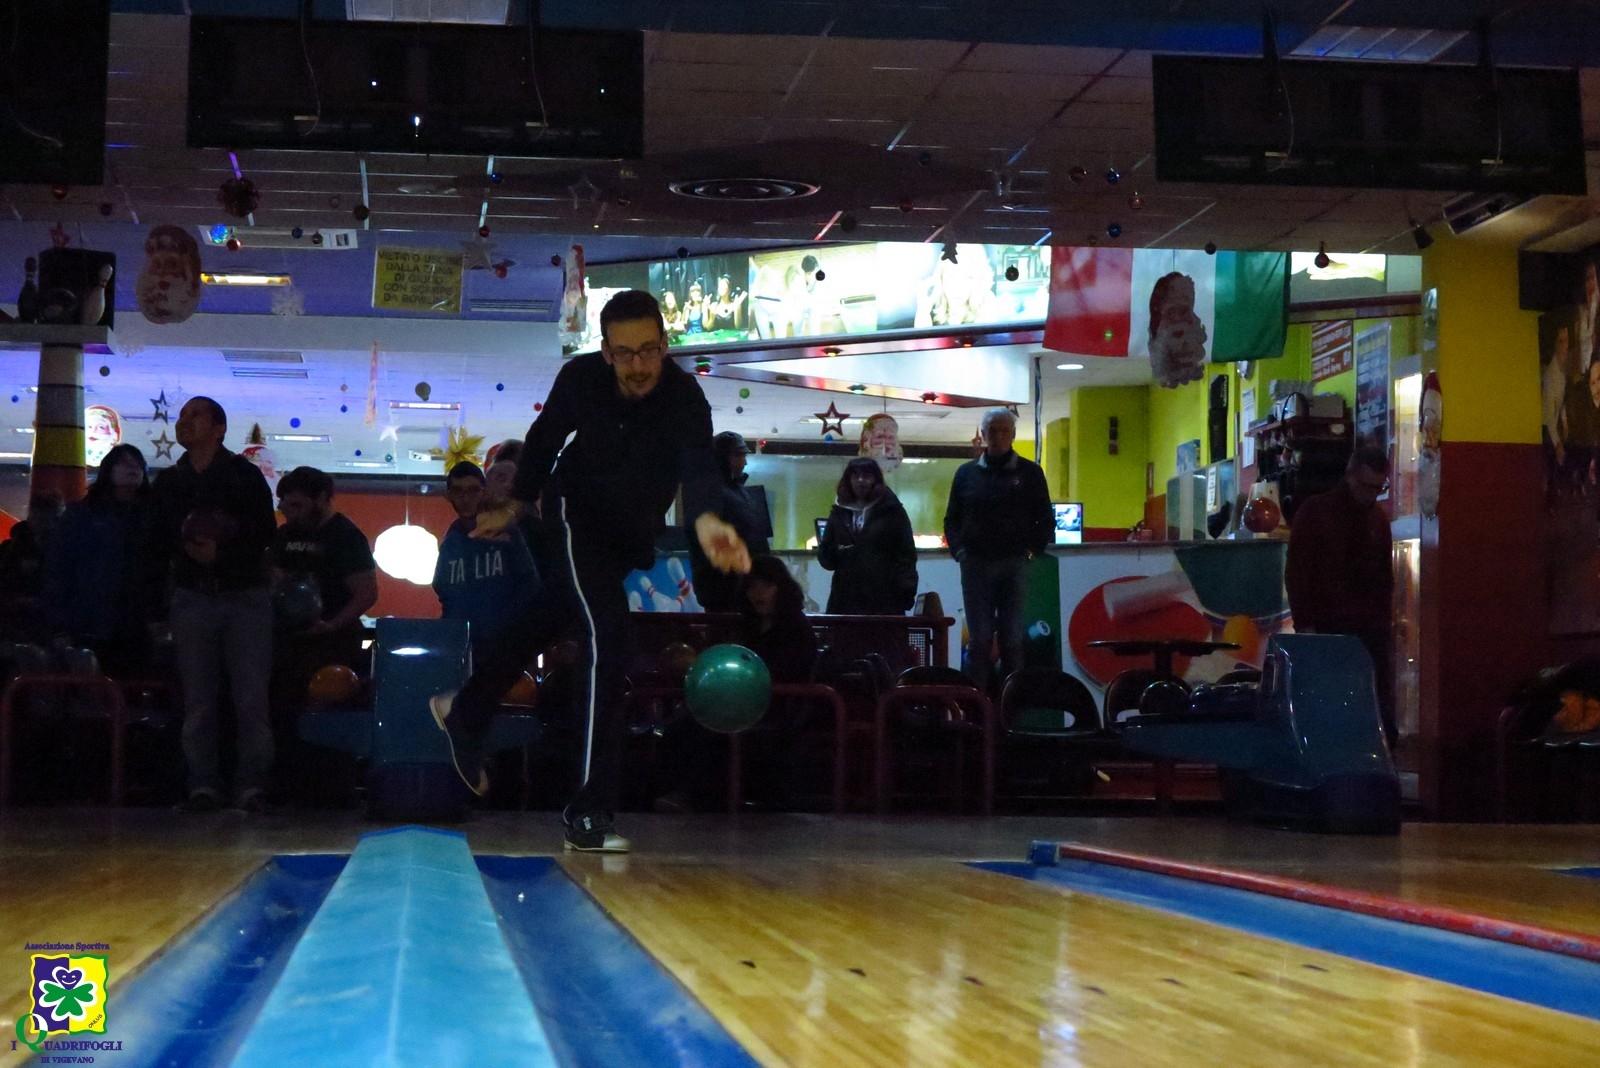 Torneo Bowling Vigevano 19-12-2018 - 018